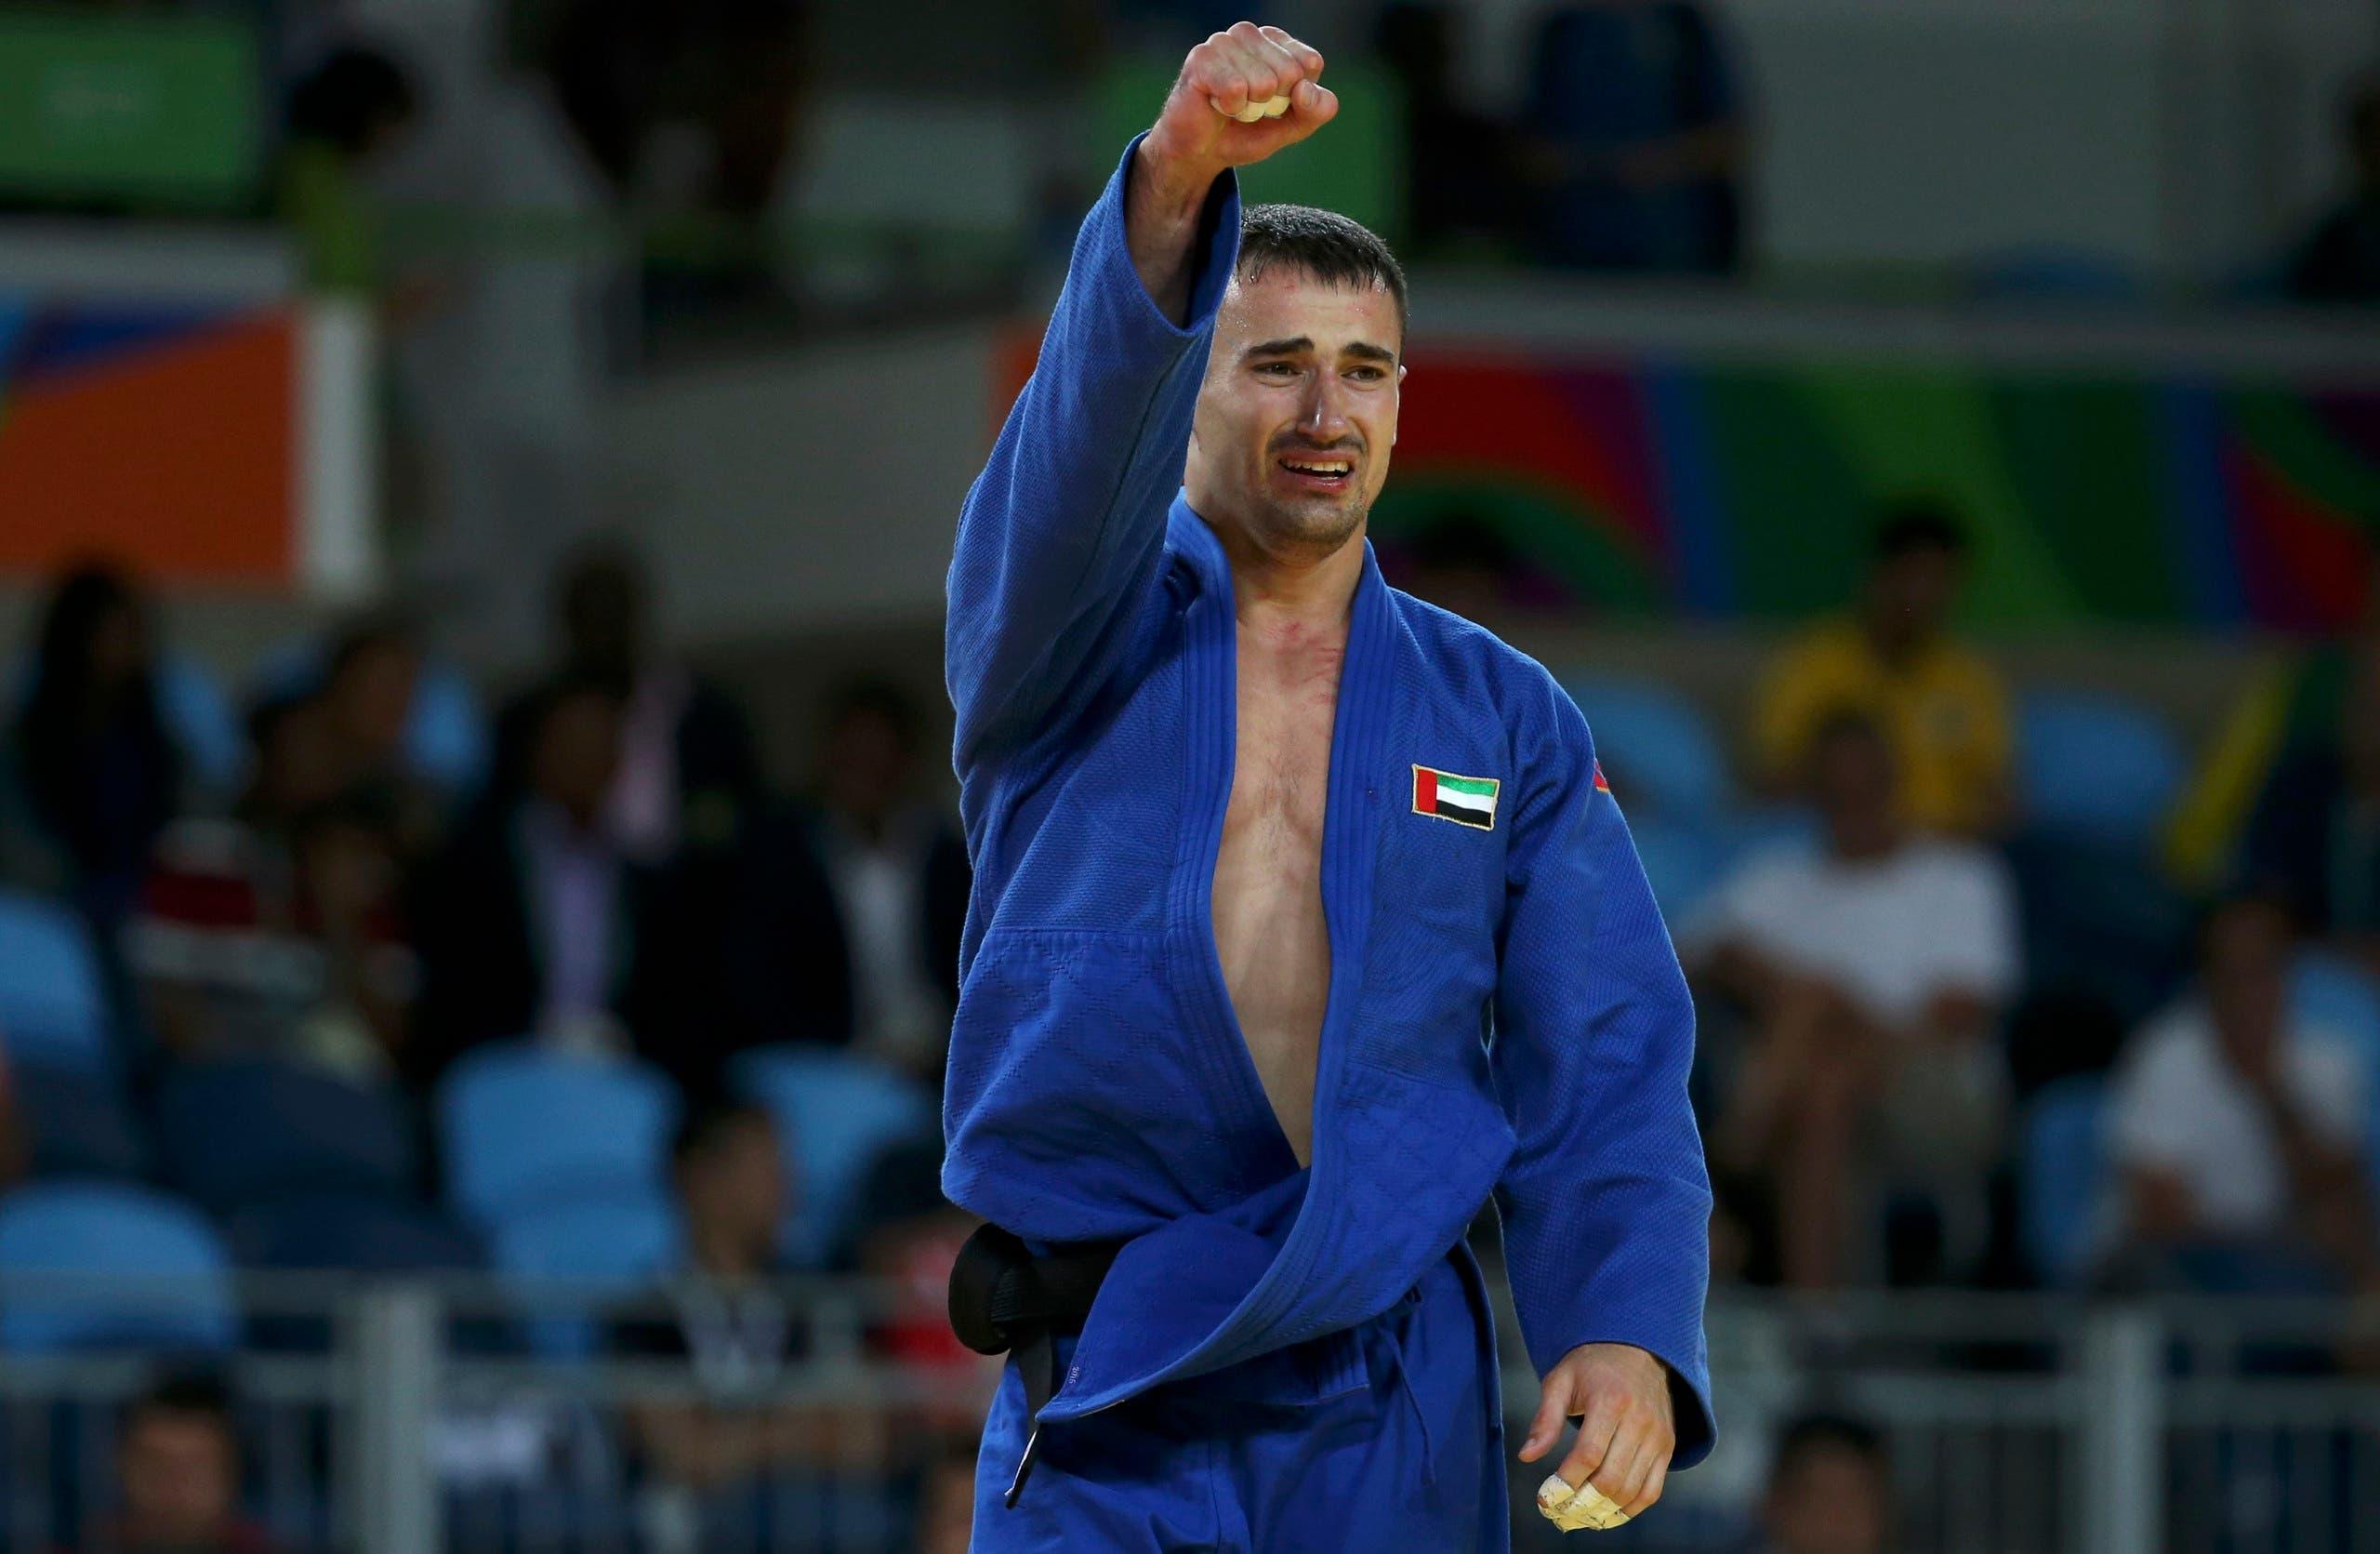 Sergiu Toma (UAE) of United Arab Emirates celebrates. (Reuters)